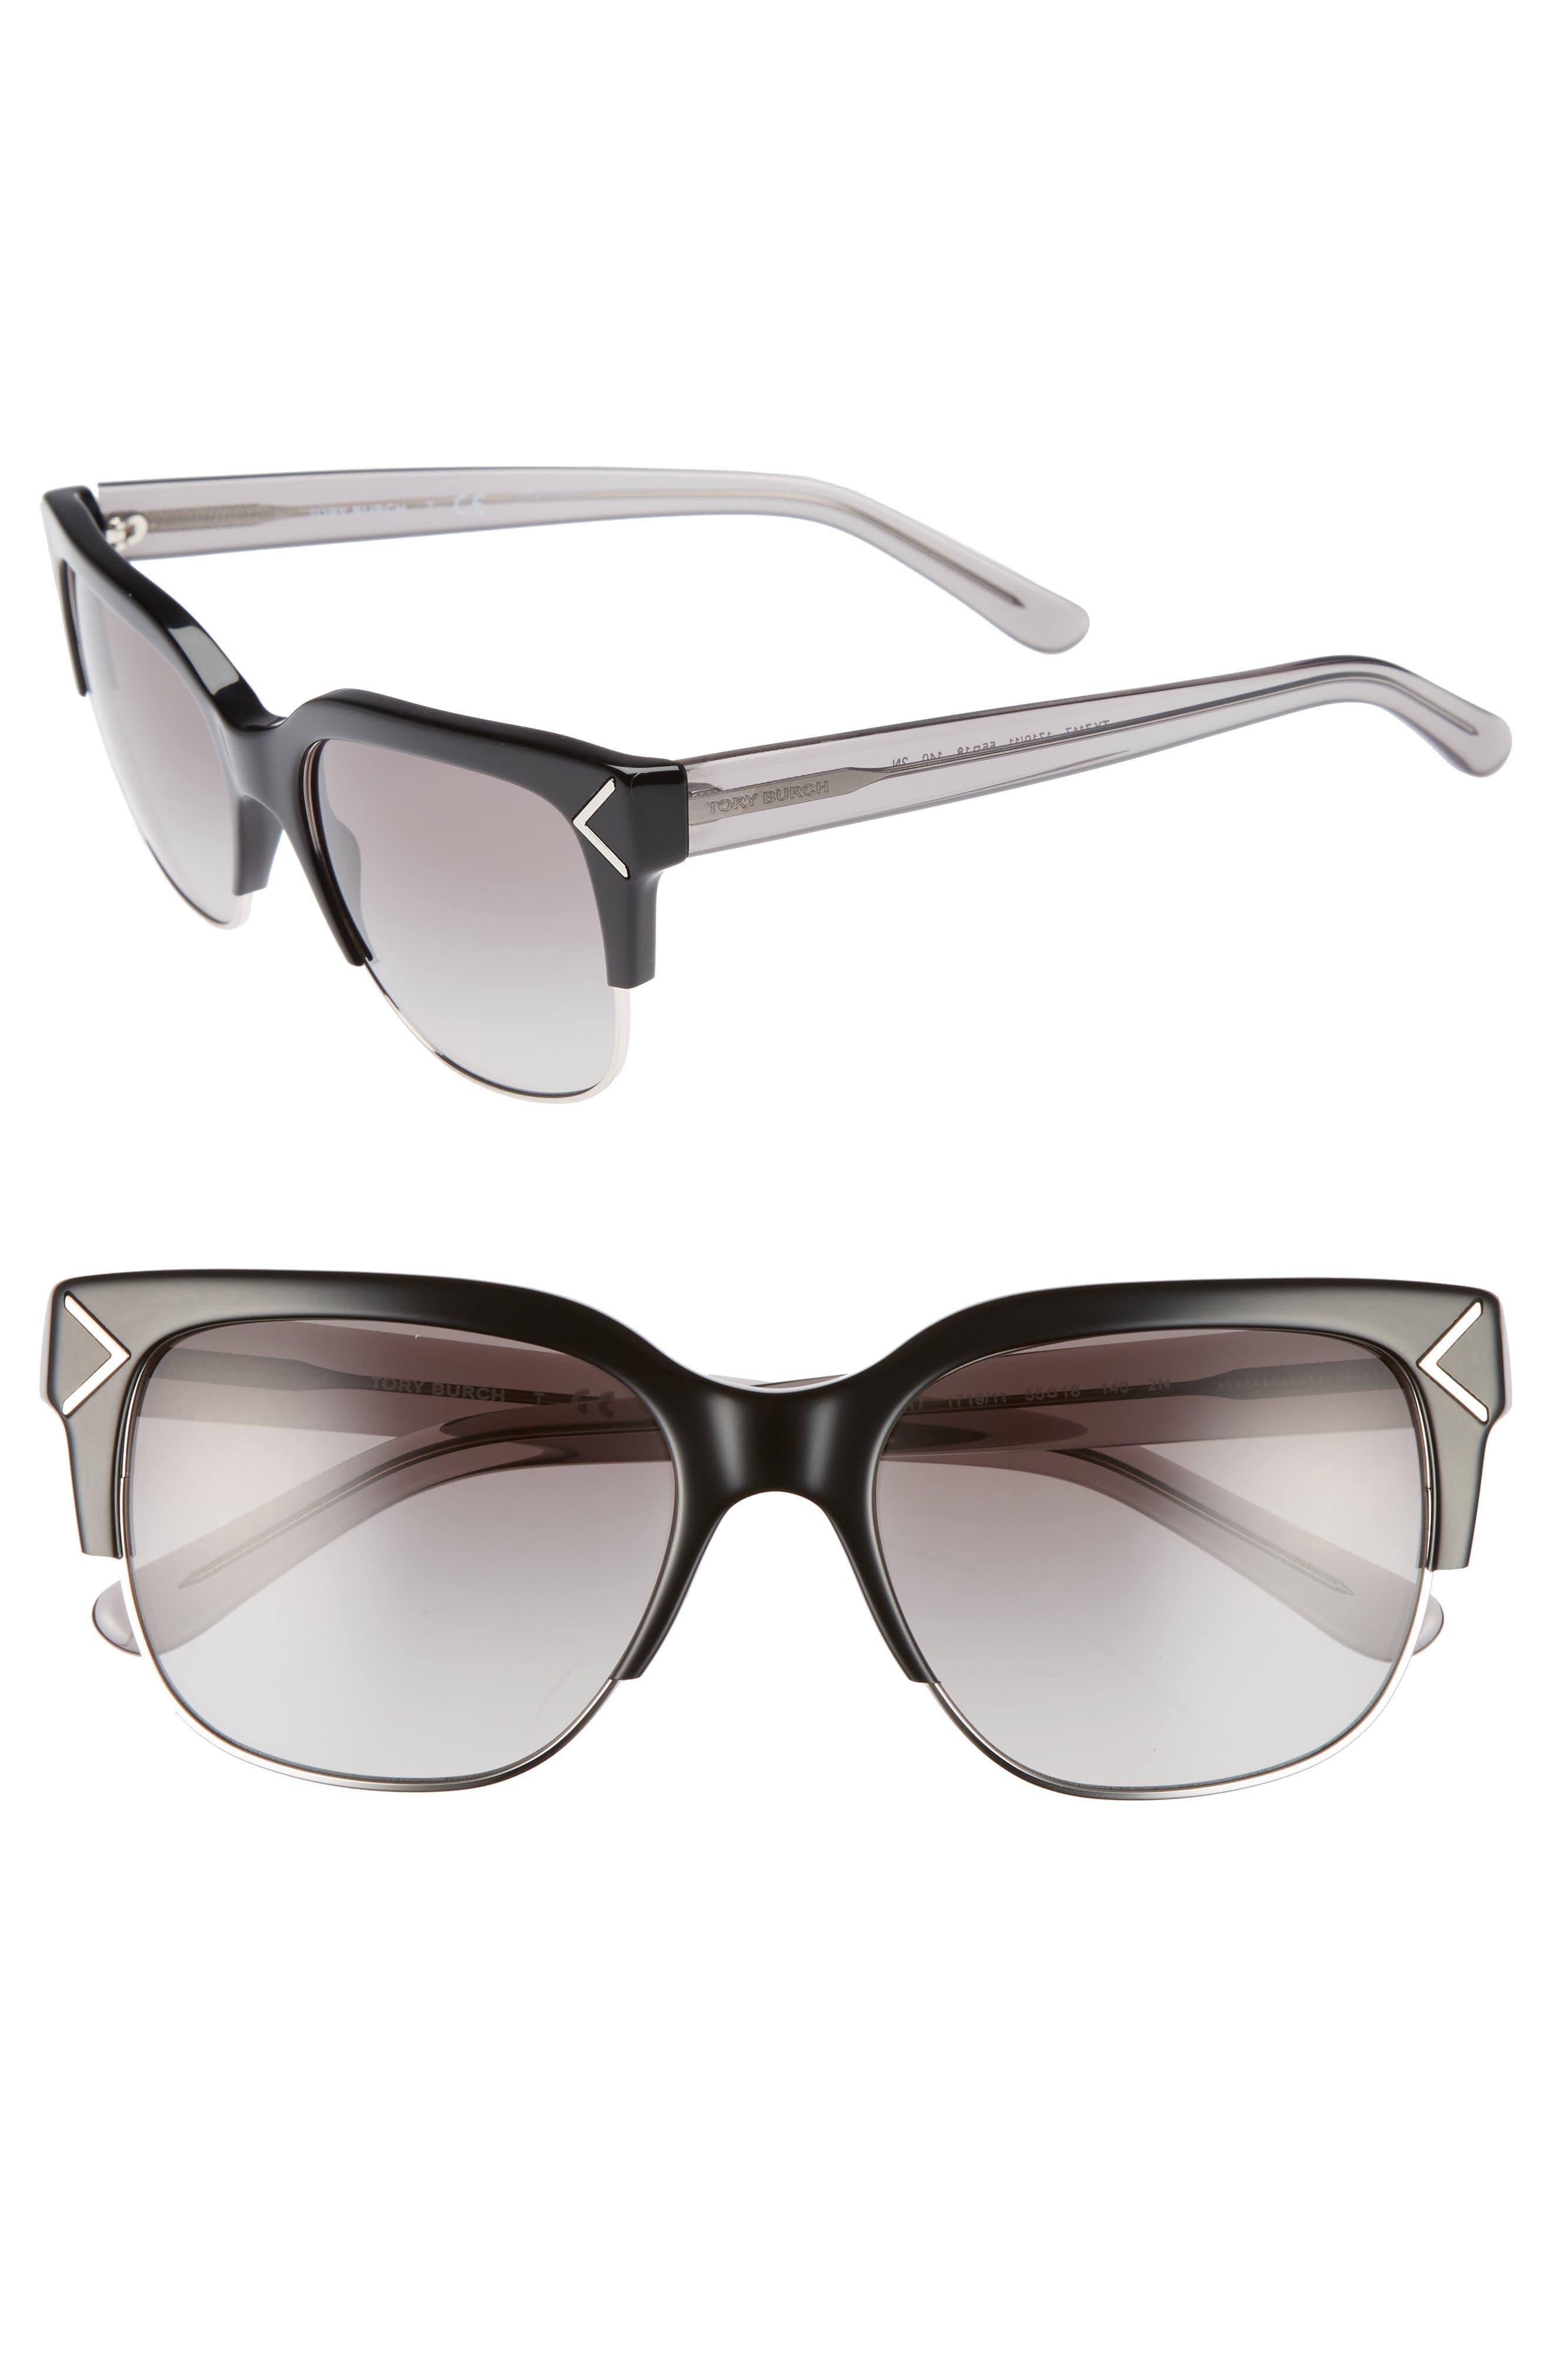 Main Image - Tory Burch 55mm Gradient Square Sunglasses